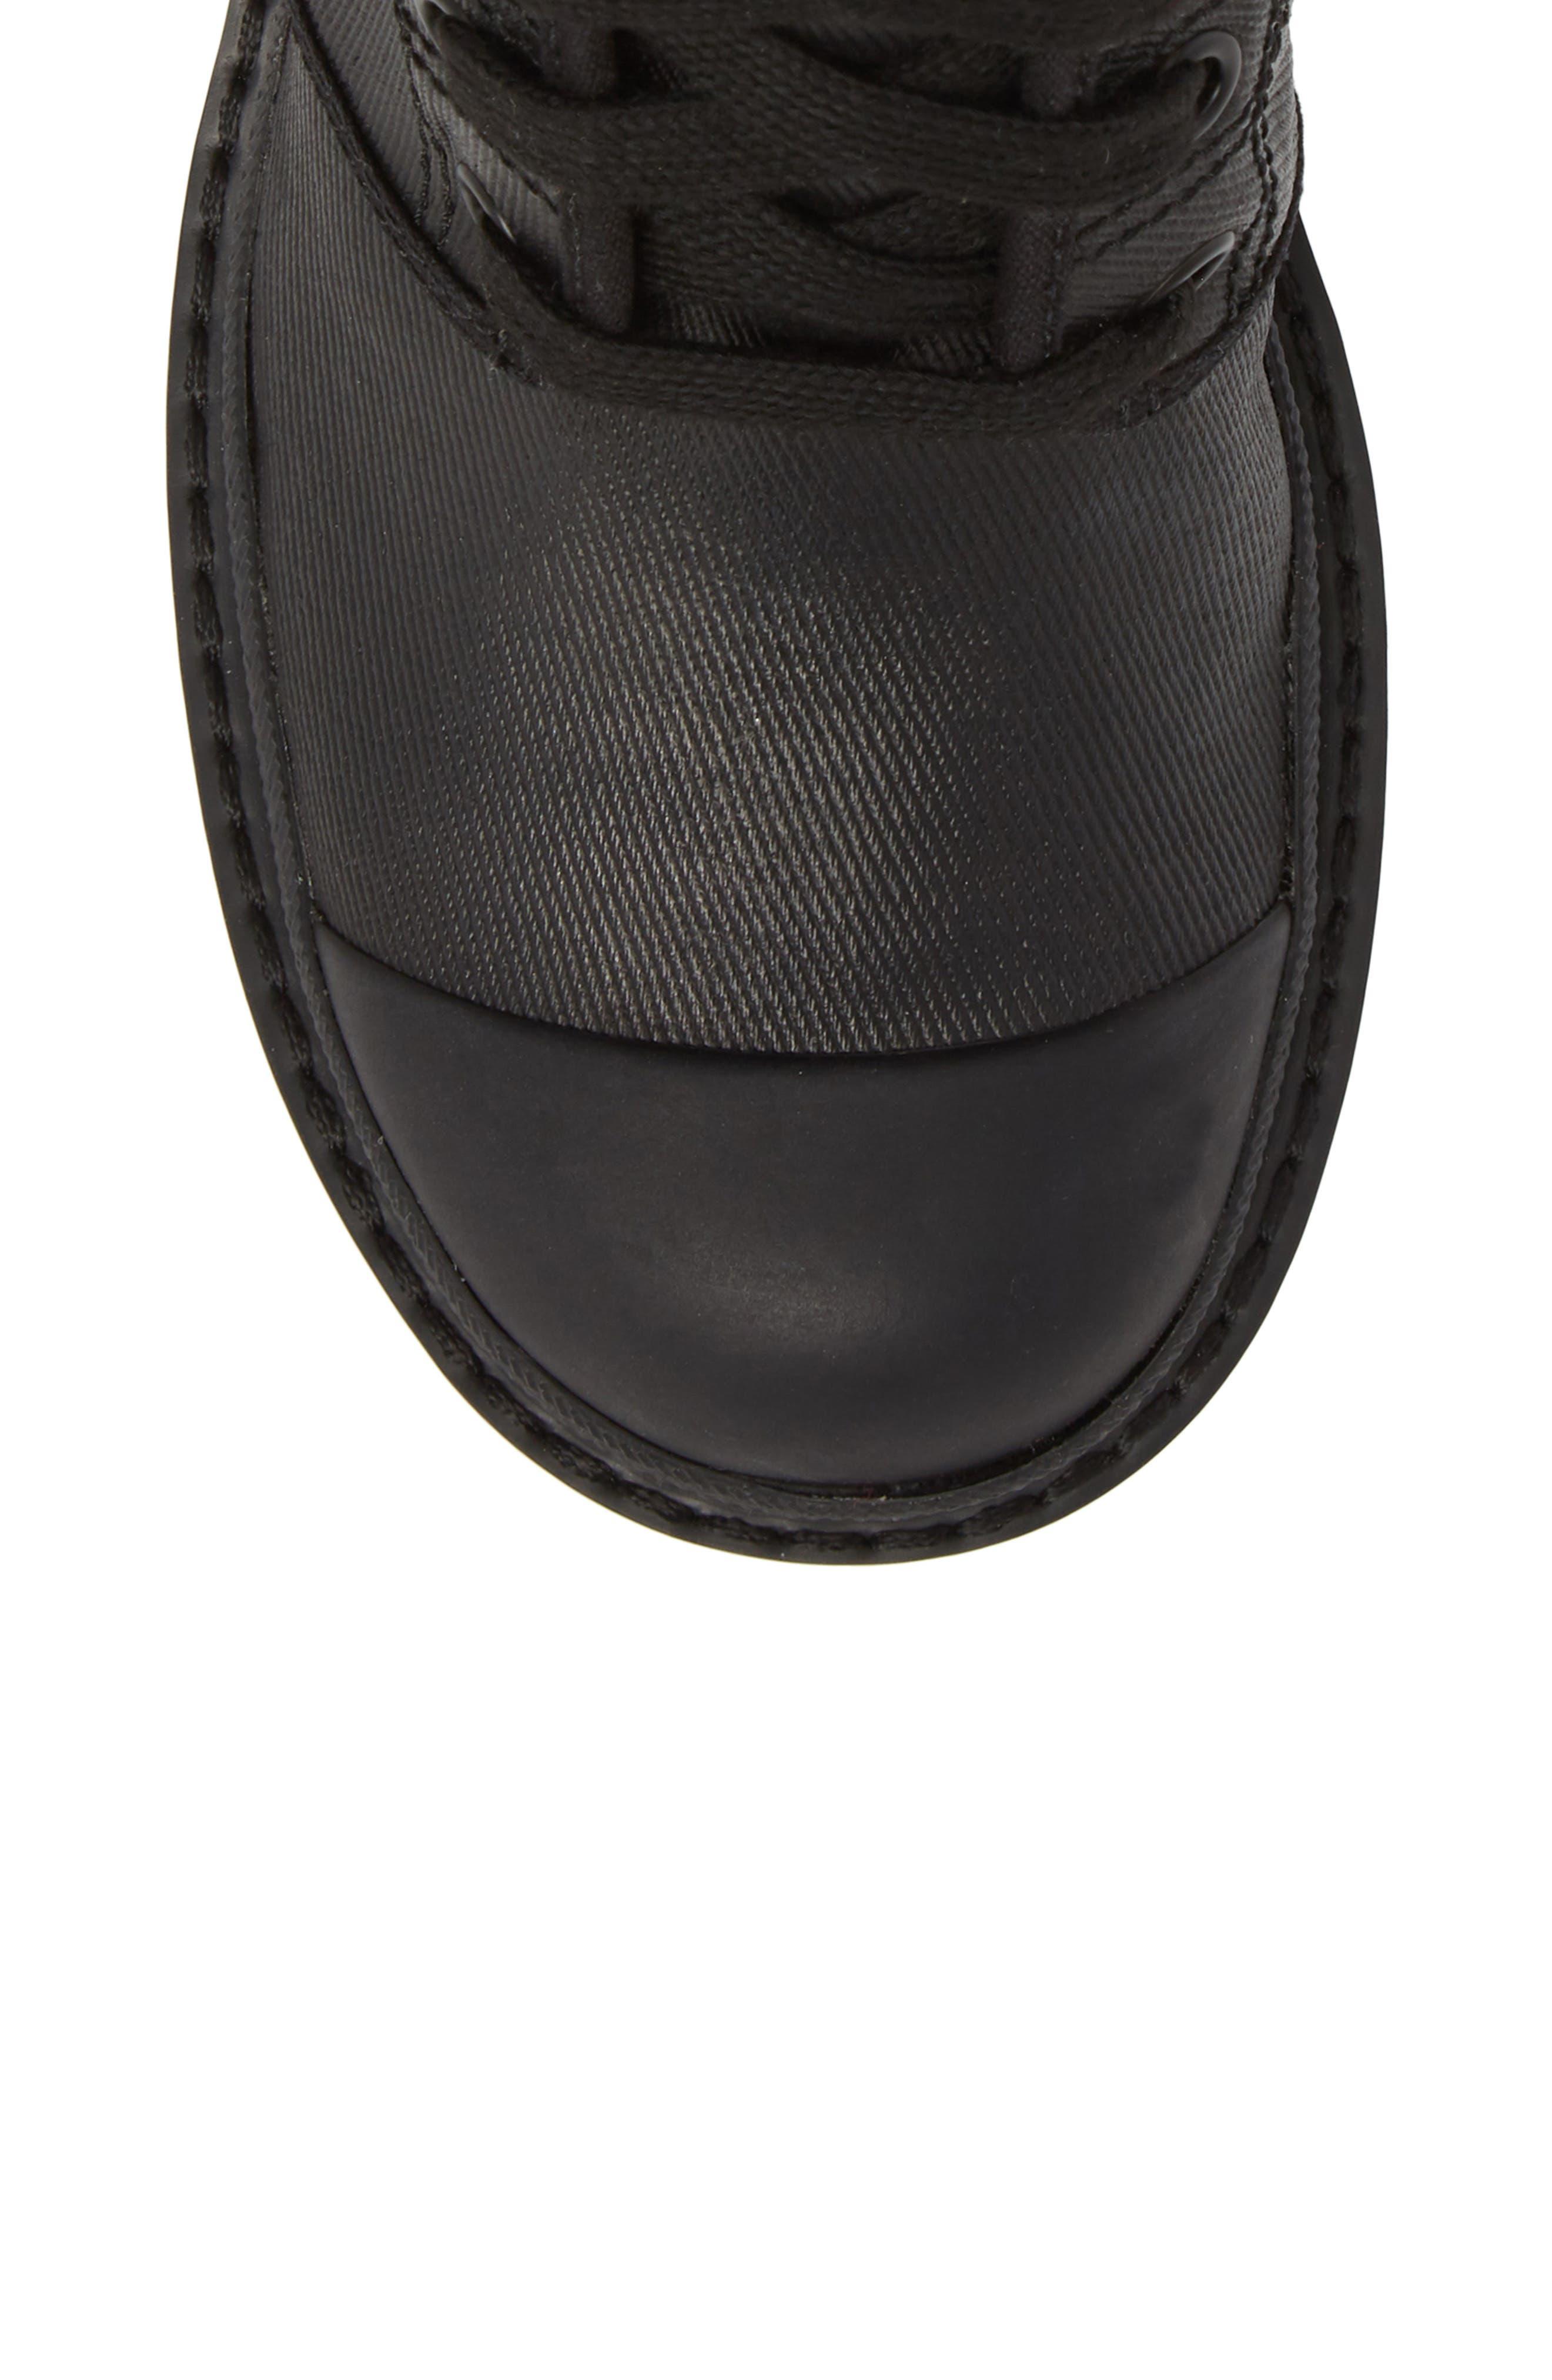 Bristol Lace-Up Boot,                             Alternate thumbnail 5, color,                             001